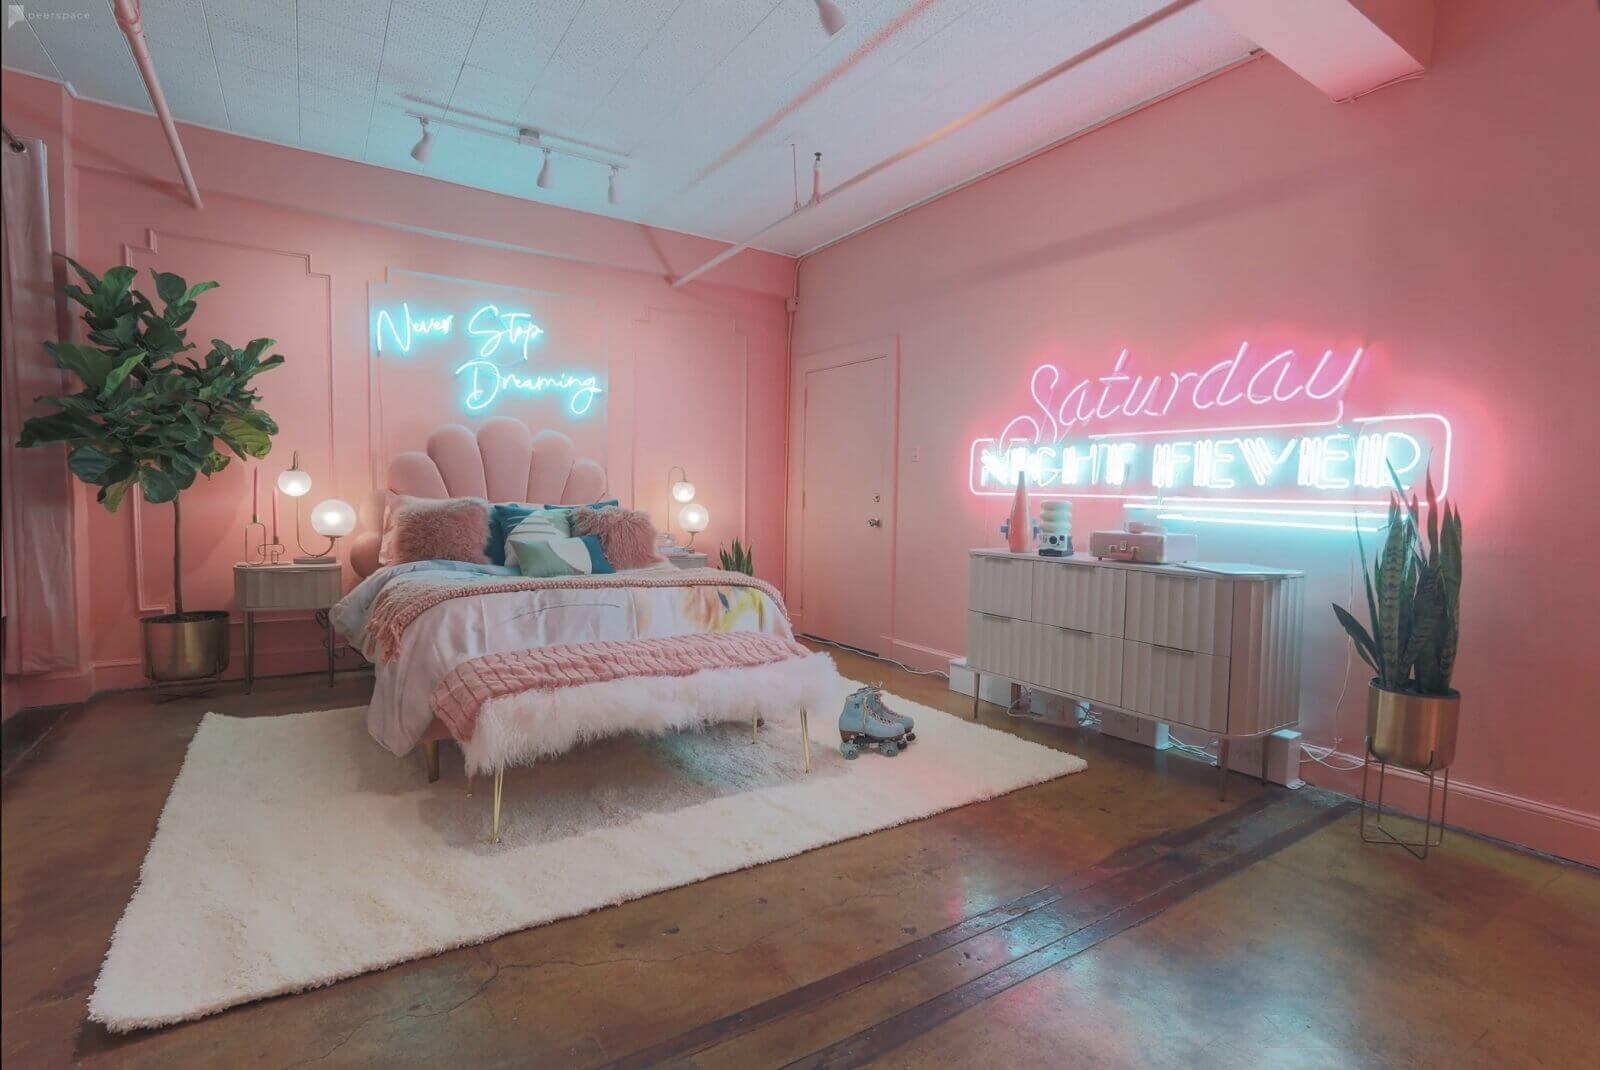 Top 10 Most Unique Filming Location - Downtown 80's Neon Pink Loft